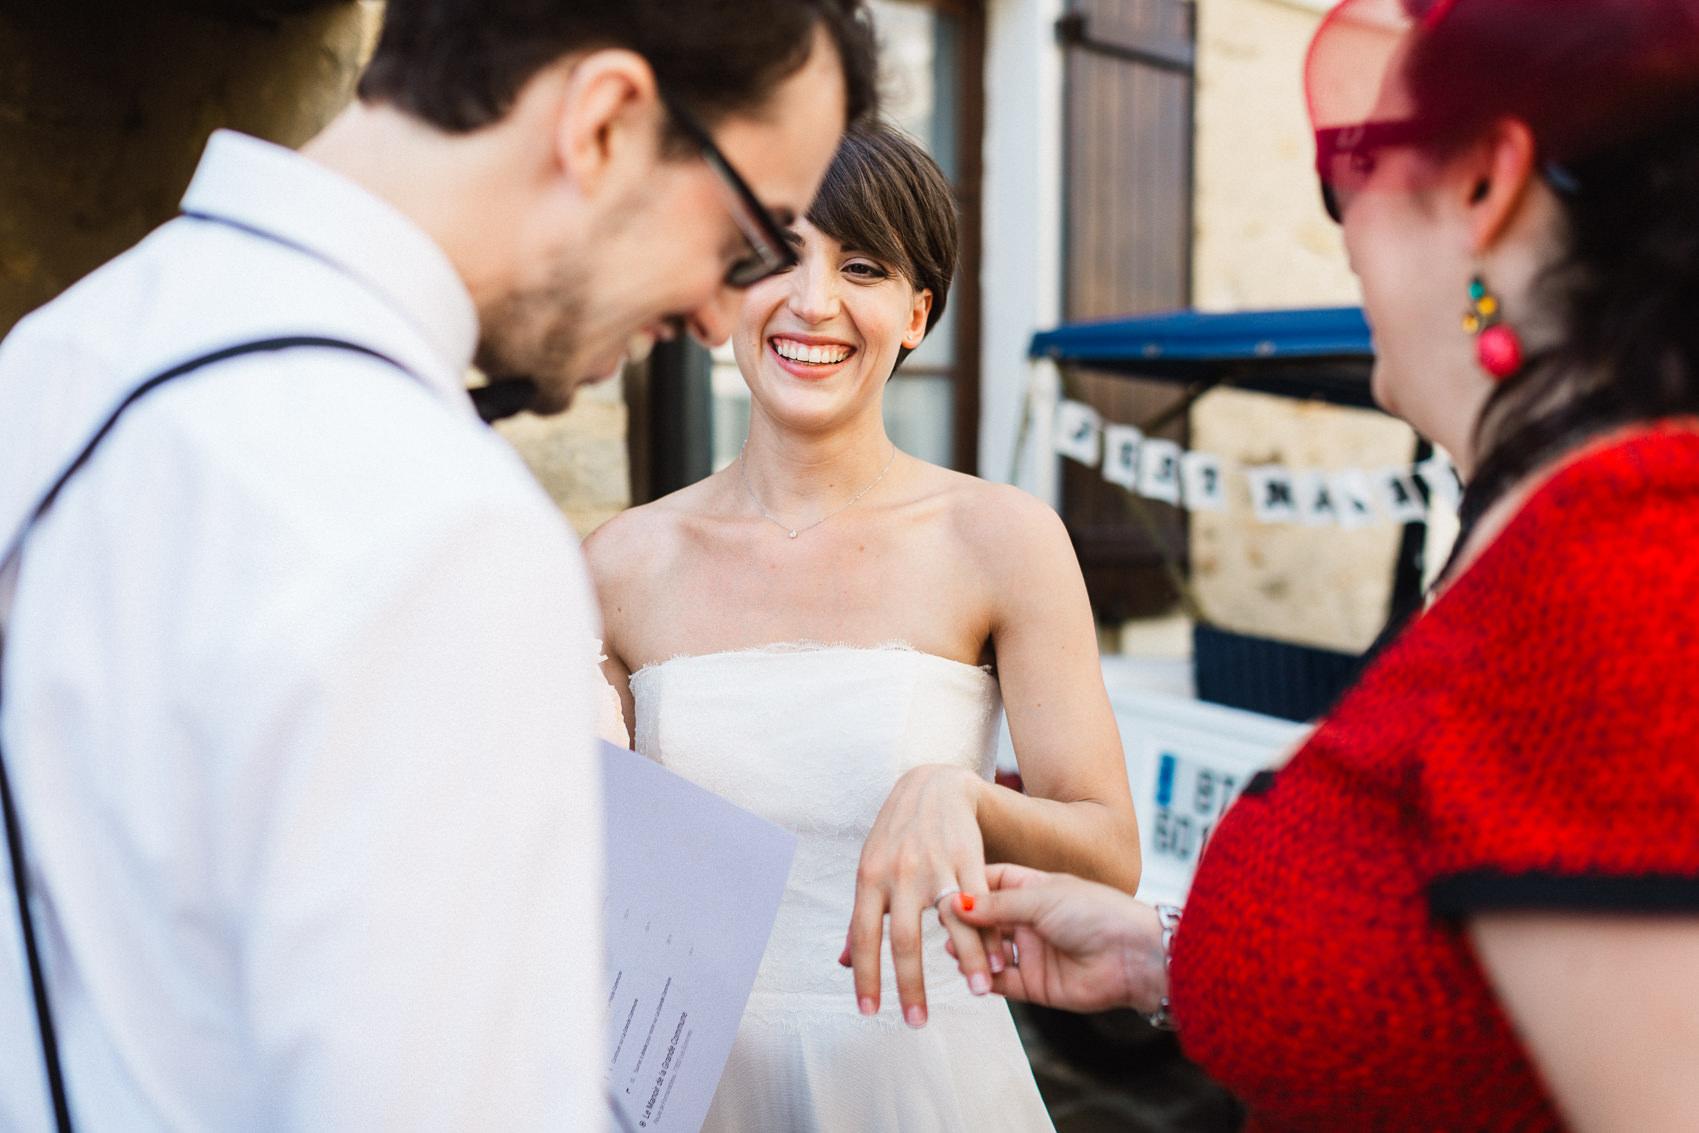 mariage-charlotte-et-joel-trendzphotography-059